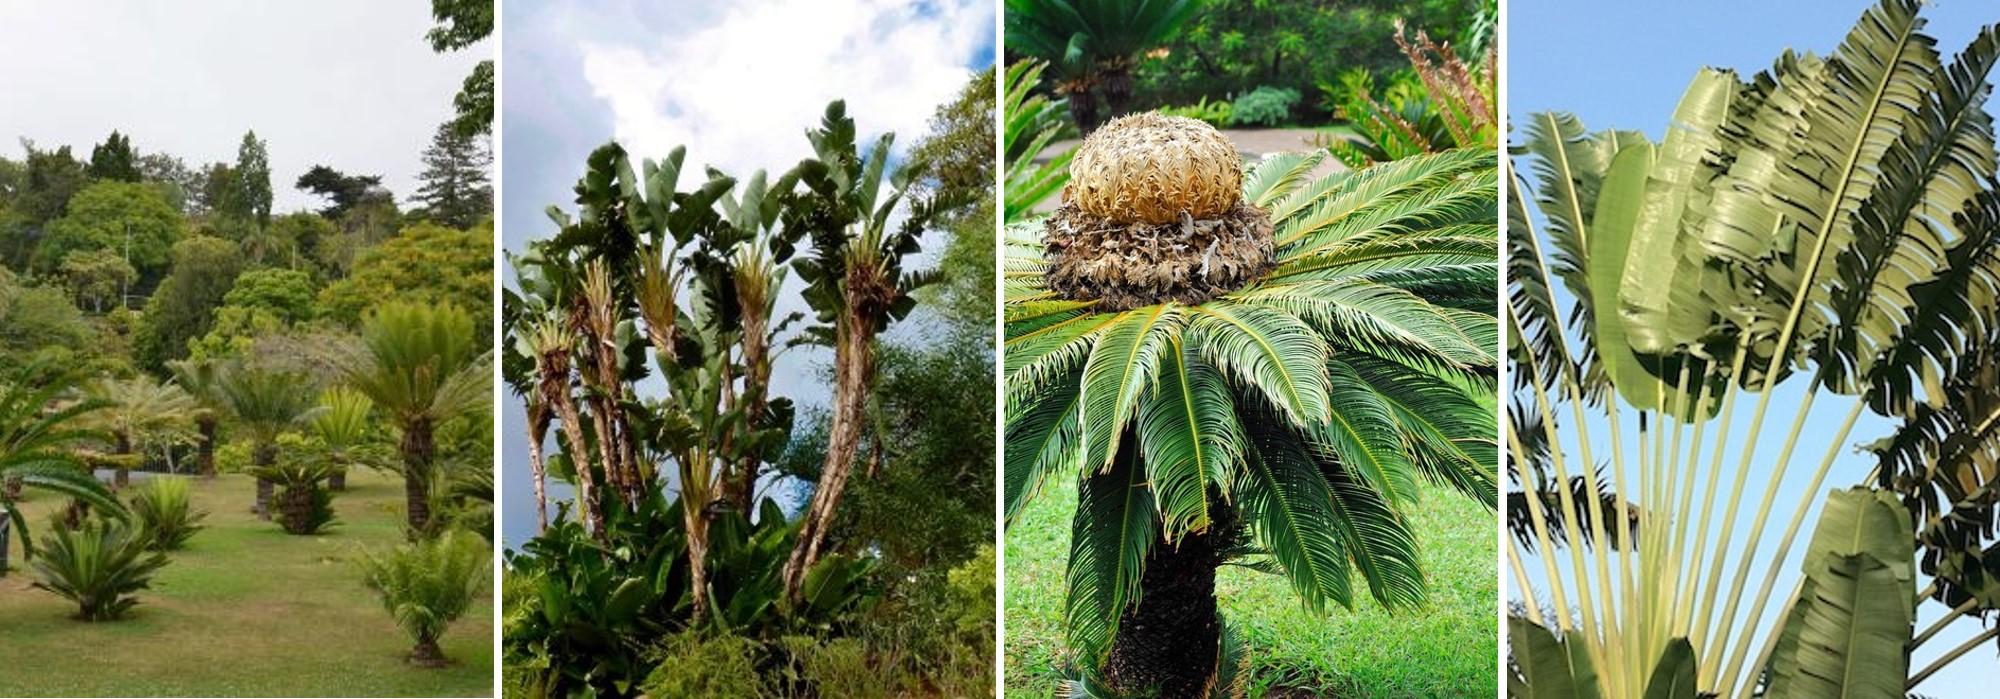 Palmen-botanische Gärten Funchal Madeira Portugal